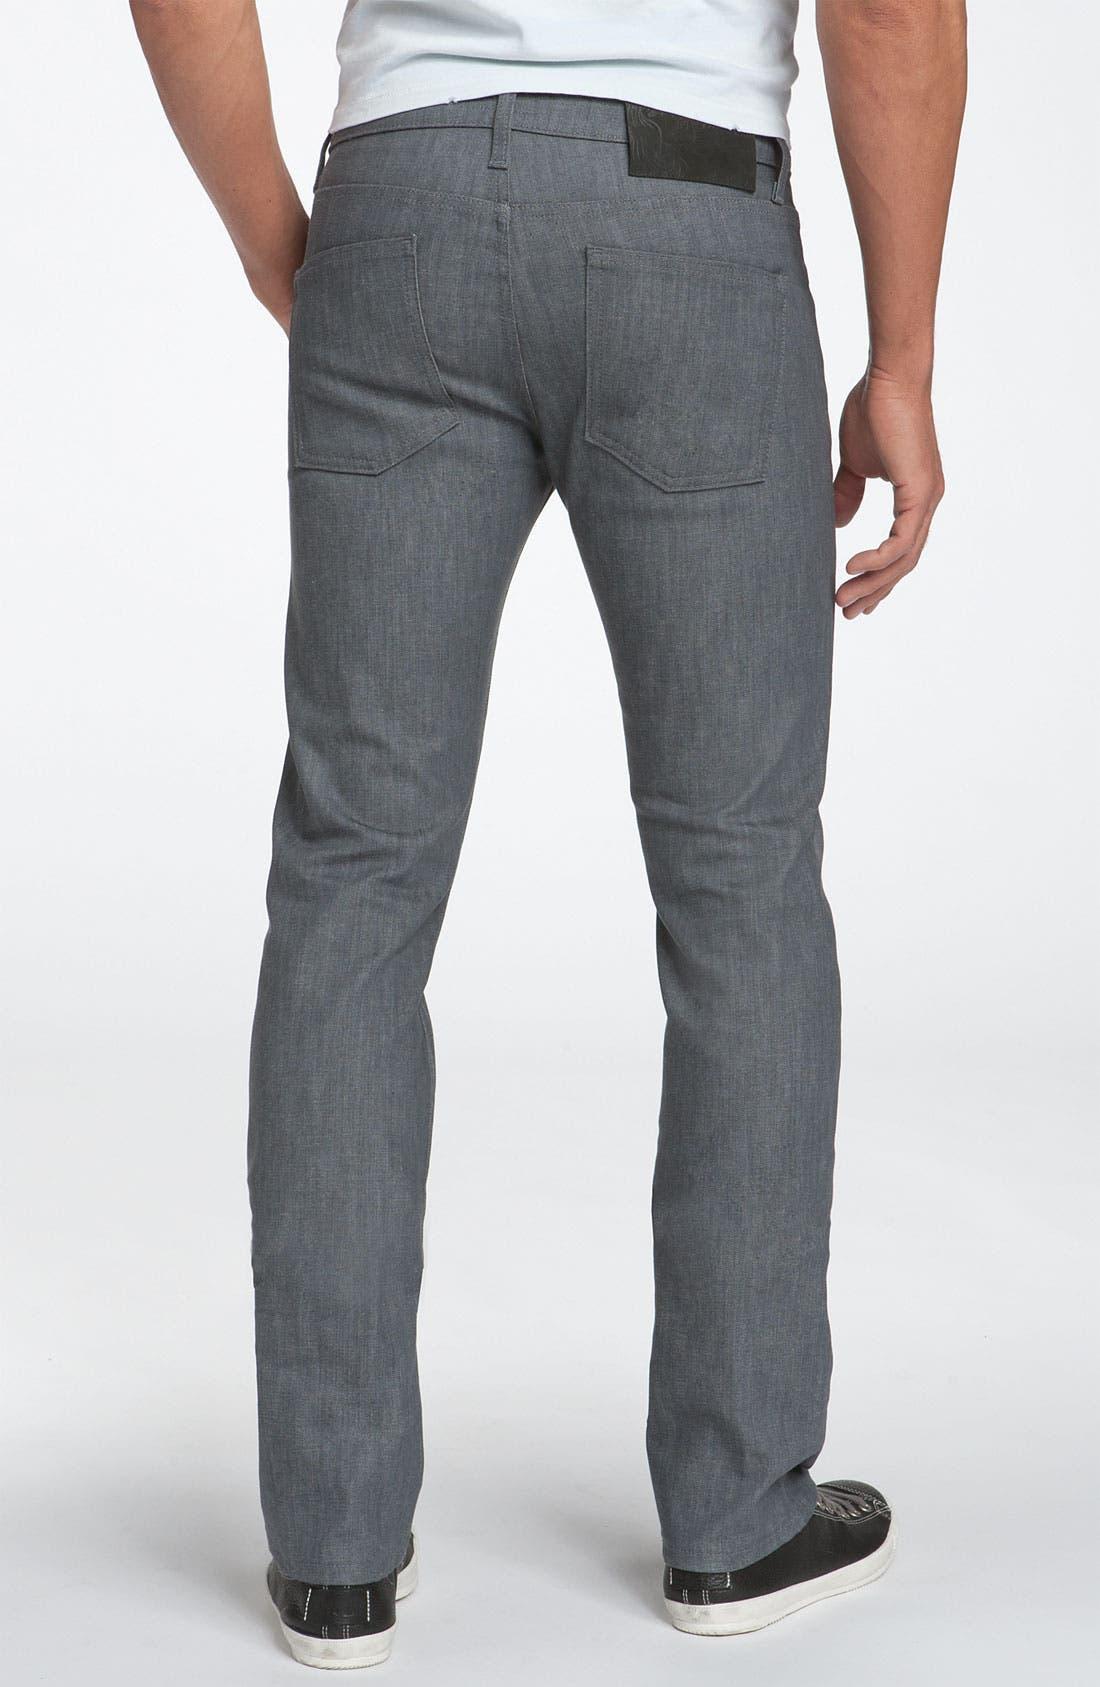 Alternate Image 2  - Naked & Famous Denim 'Skinny Guy' Skinny Fit Jeans (Grey Stretch Wash)